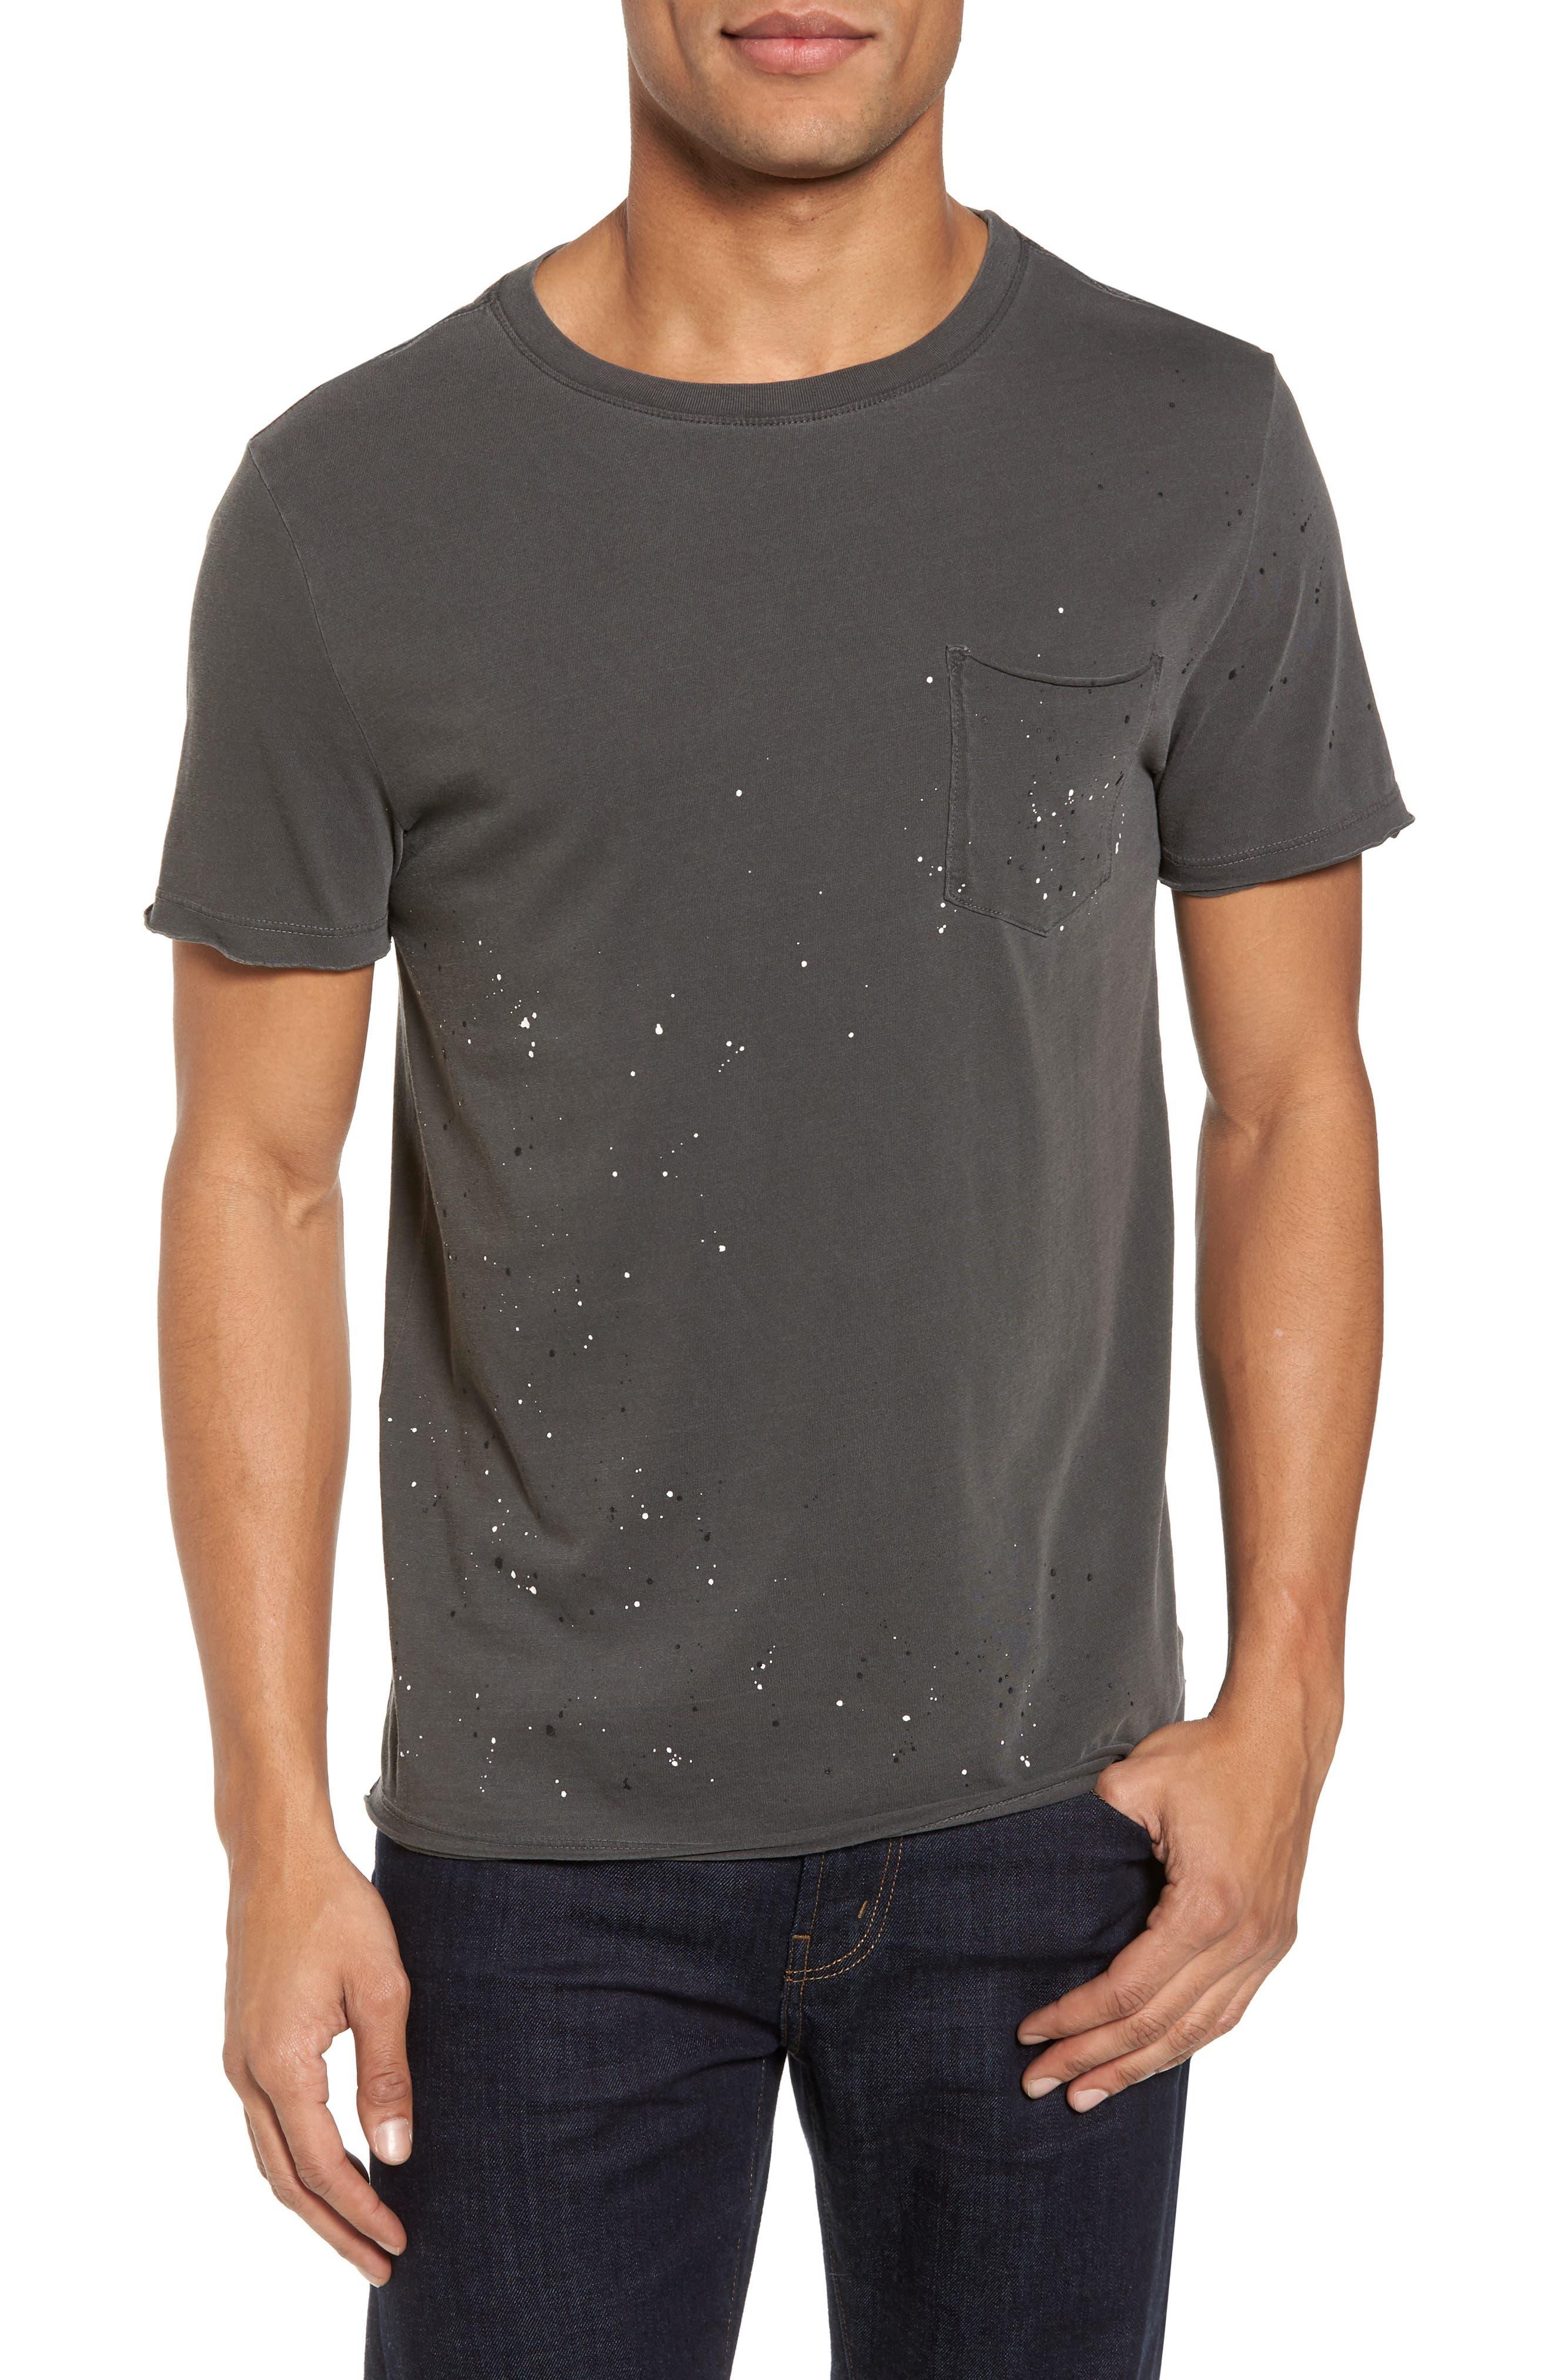 Anders Slim Fit Pocket T-Shirt,                         Main,                         color, Multi Splatter Pigment Black